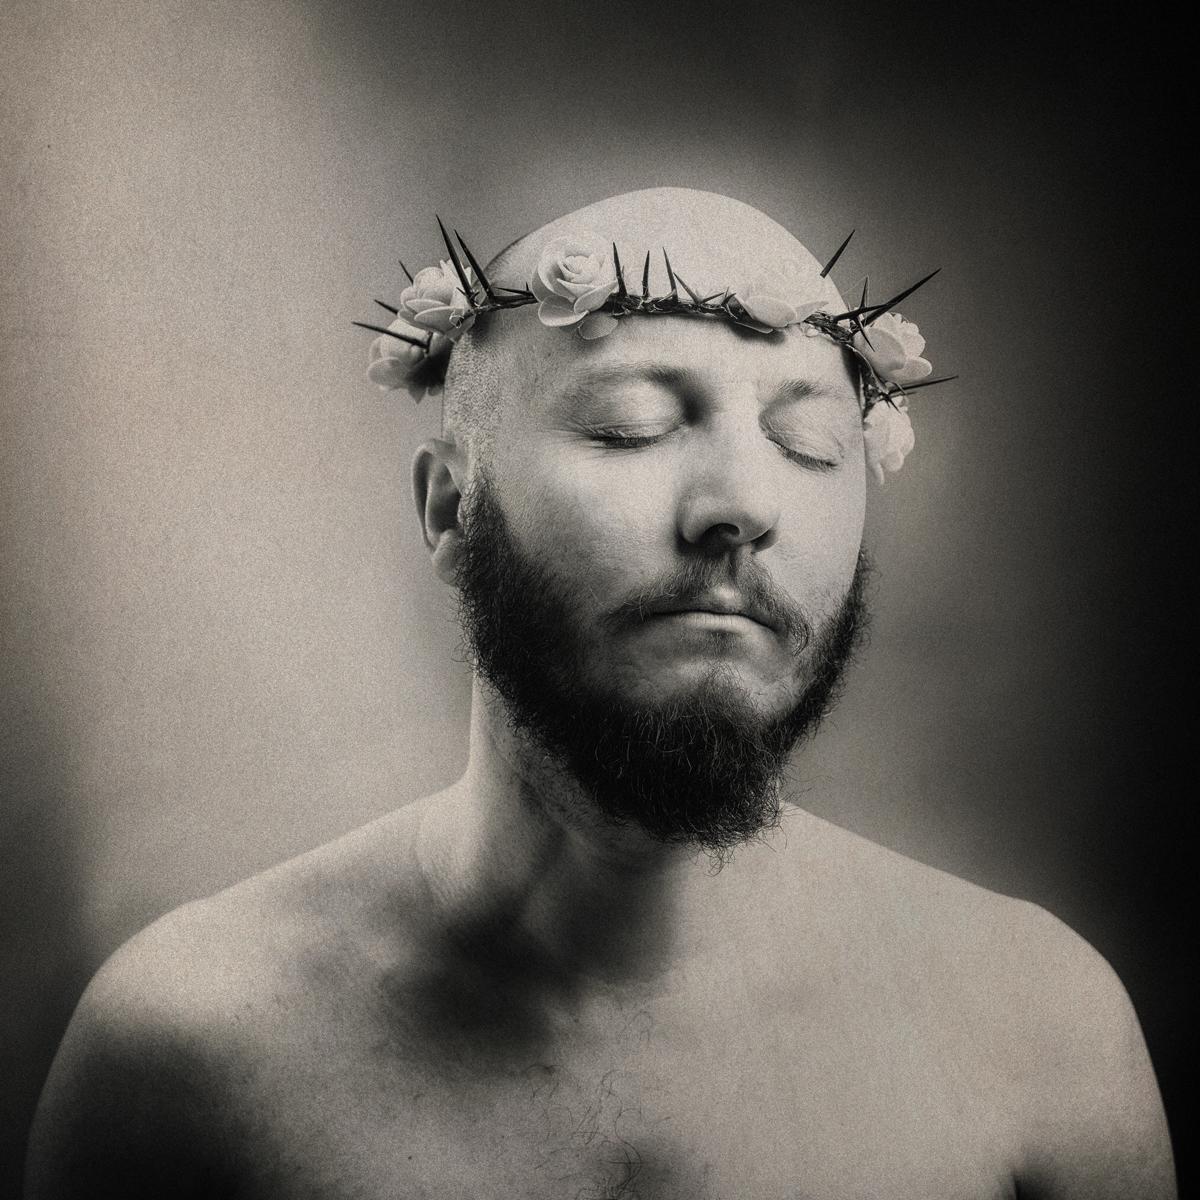 Не забравяй короната си   Author Stefan Kamenov - stephoko   PHOTO FORUM